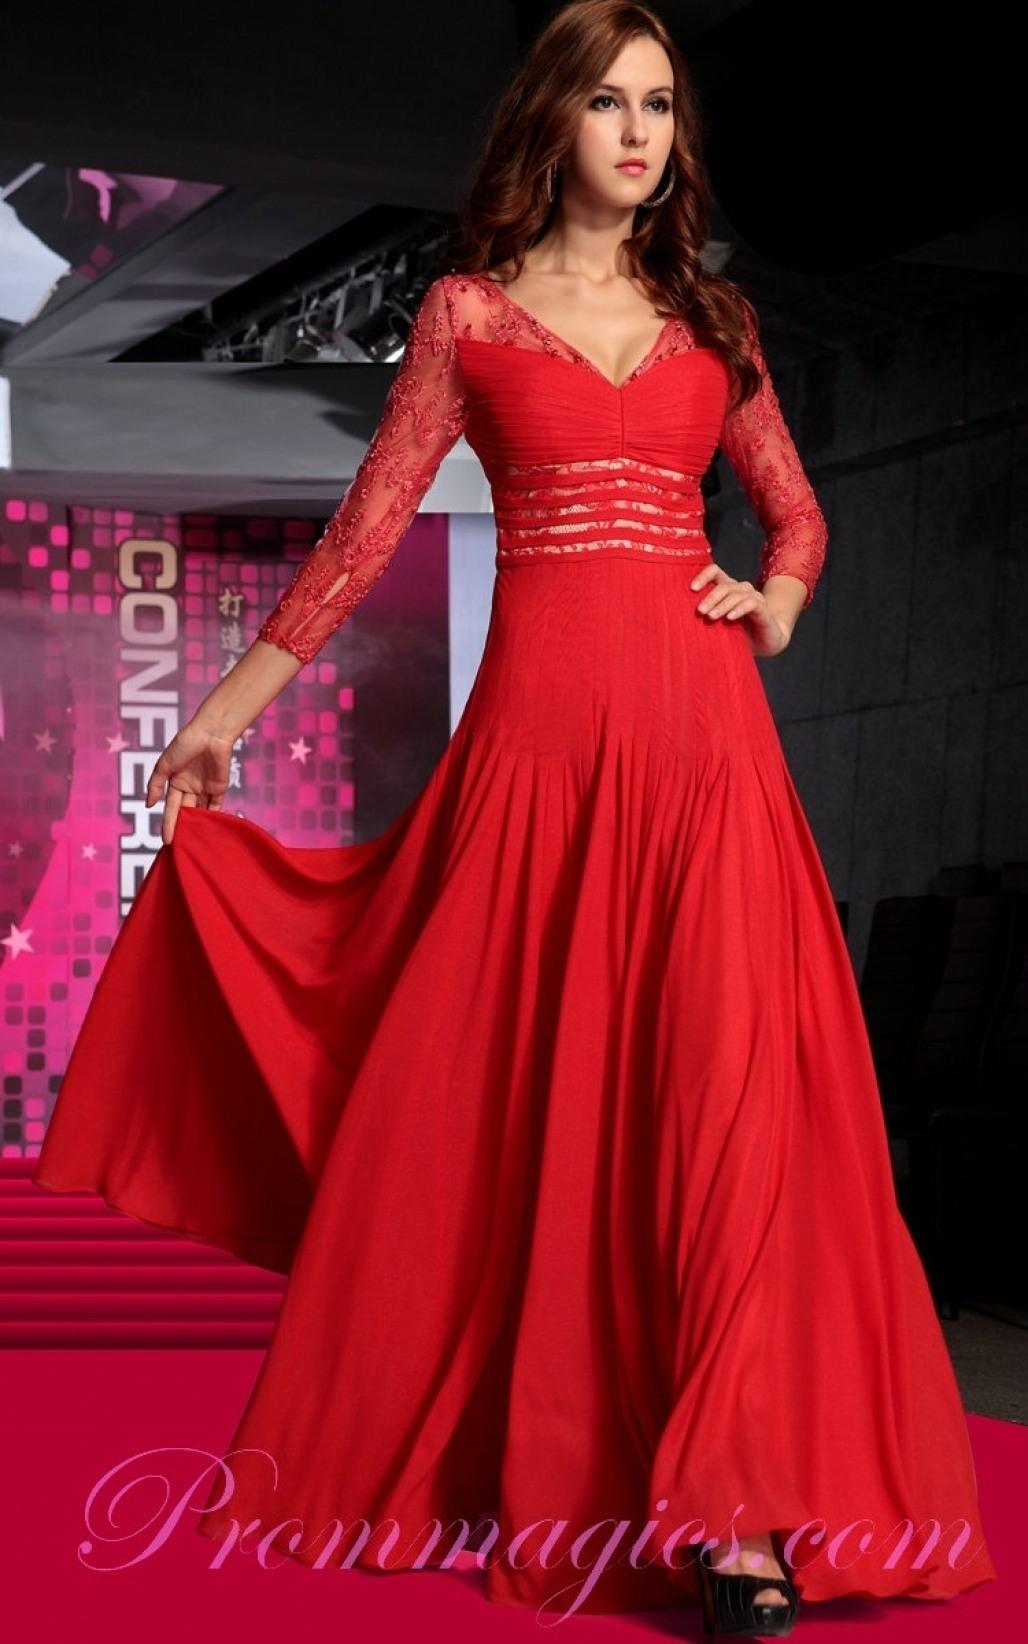 Designer Großartig Abendkleider Lang Günstig Kaufen Vertrieb13 Kreativ Abendkleider Lang Günstig Kaufen Vertrieb